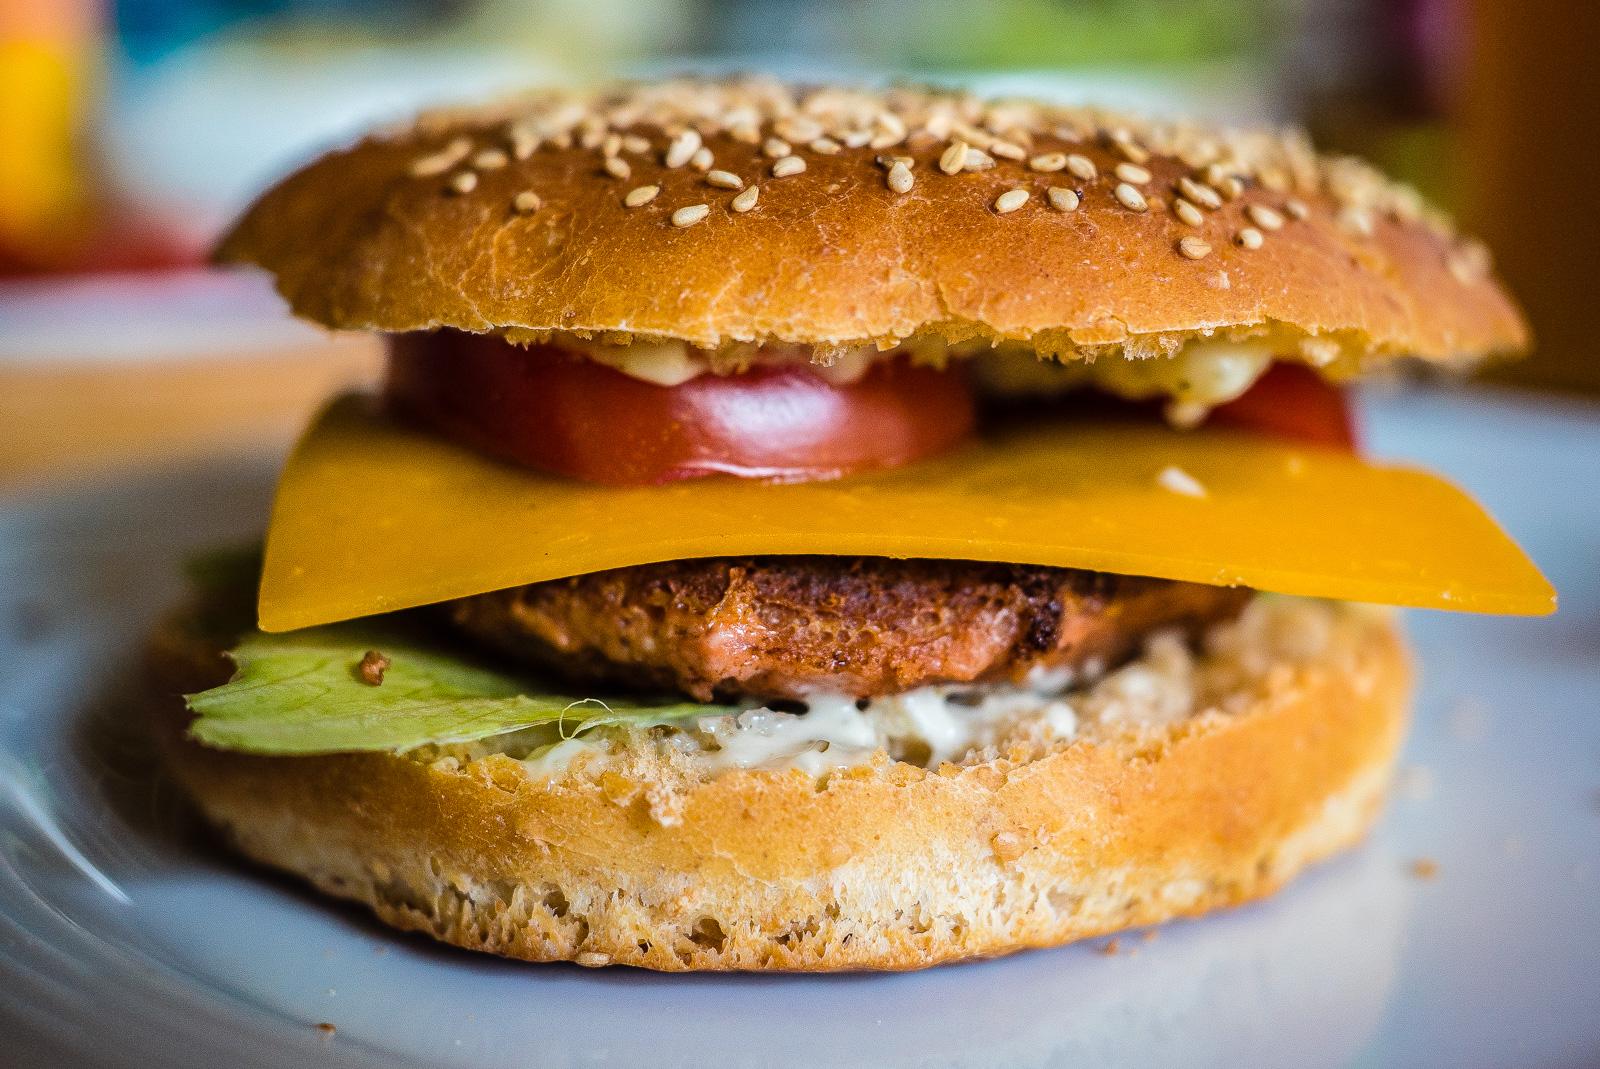 veganer Burger in selbst gebackenem Brötchen